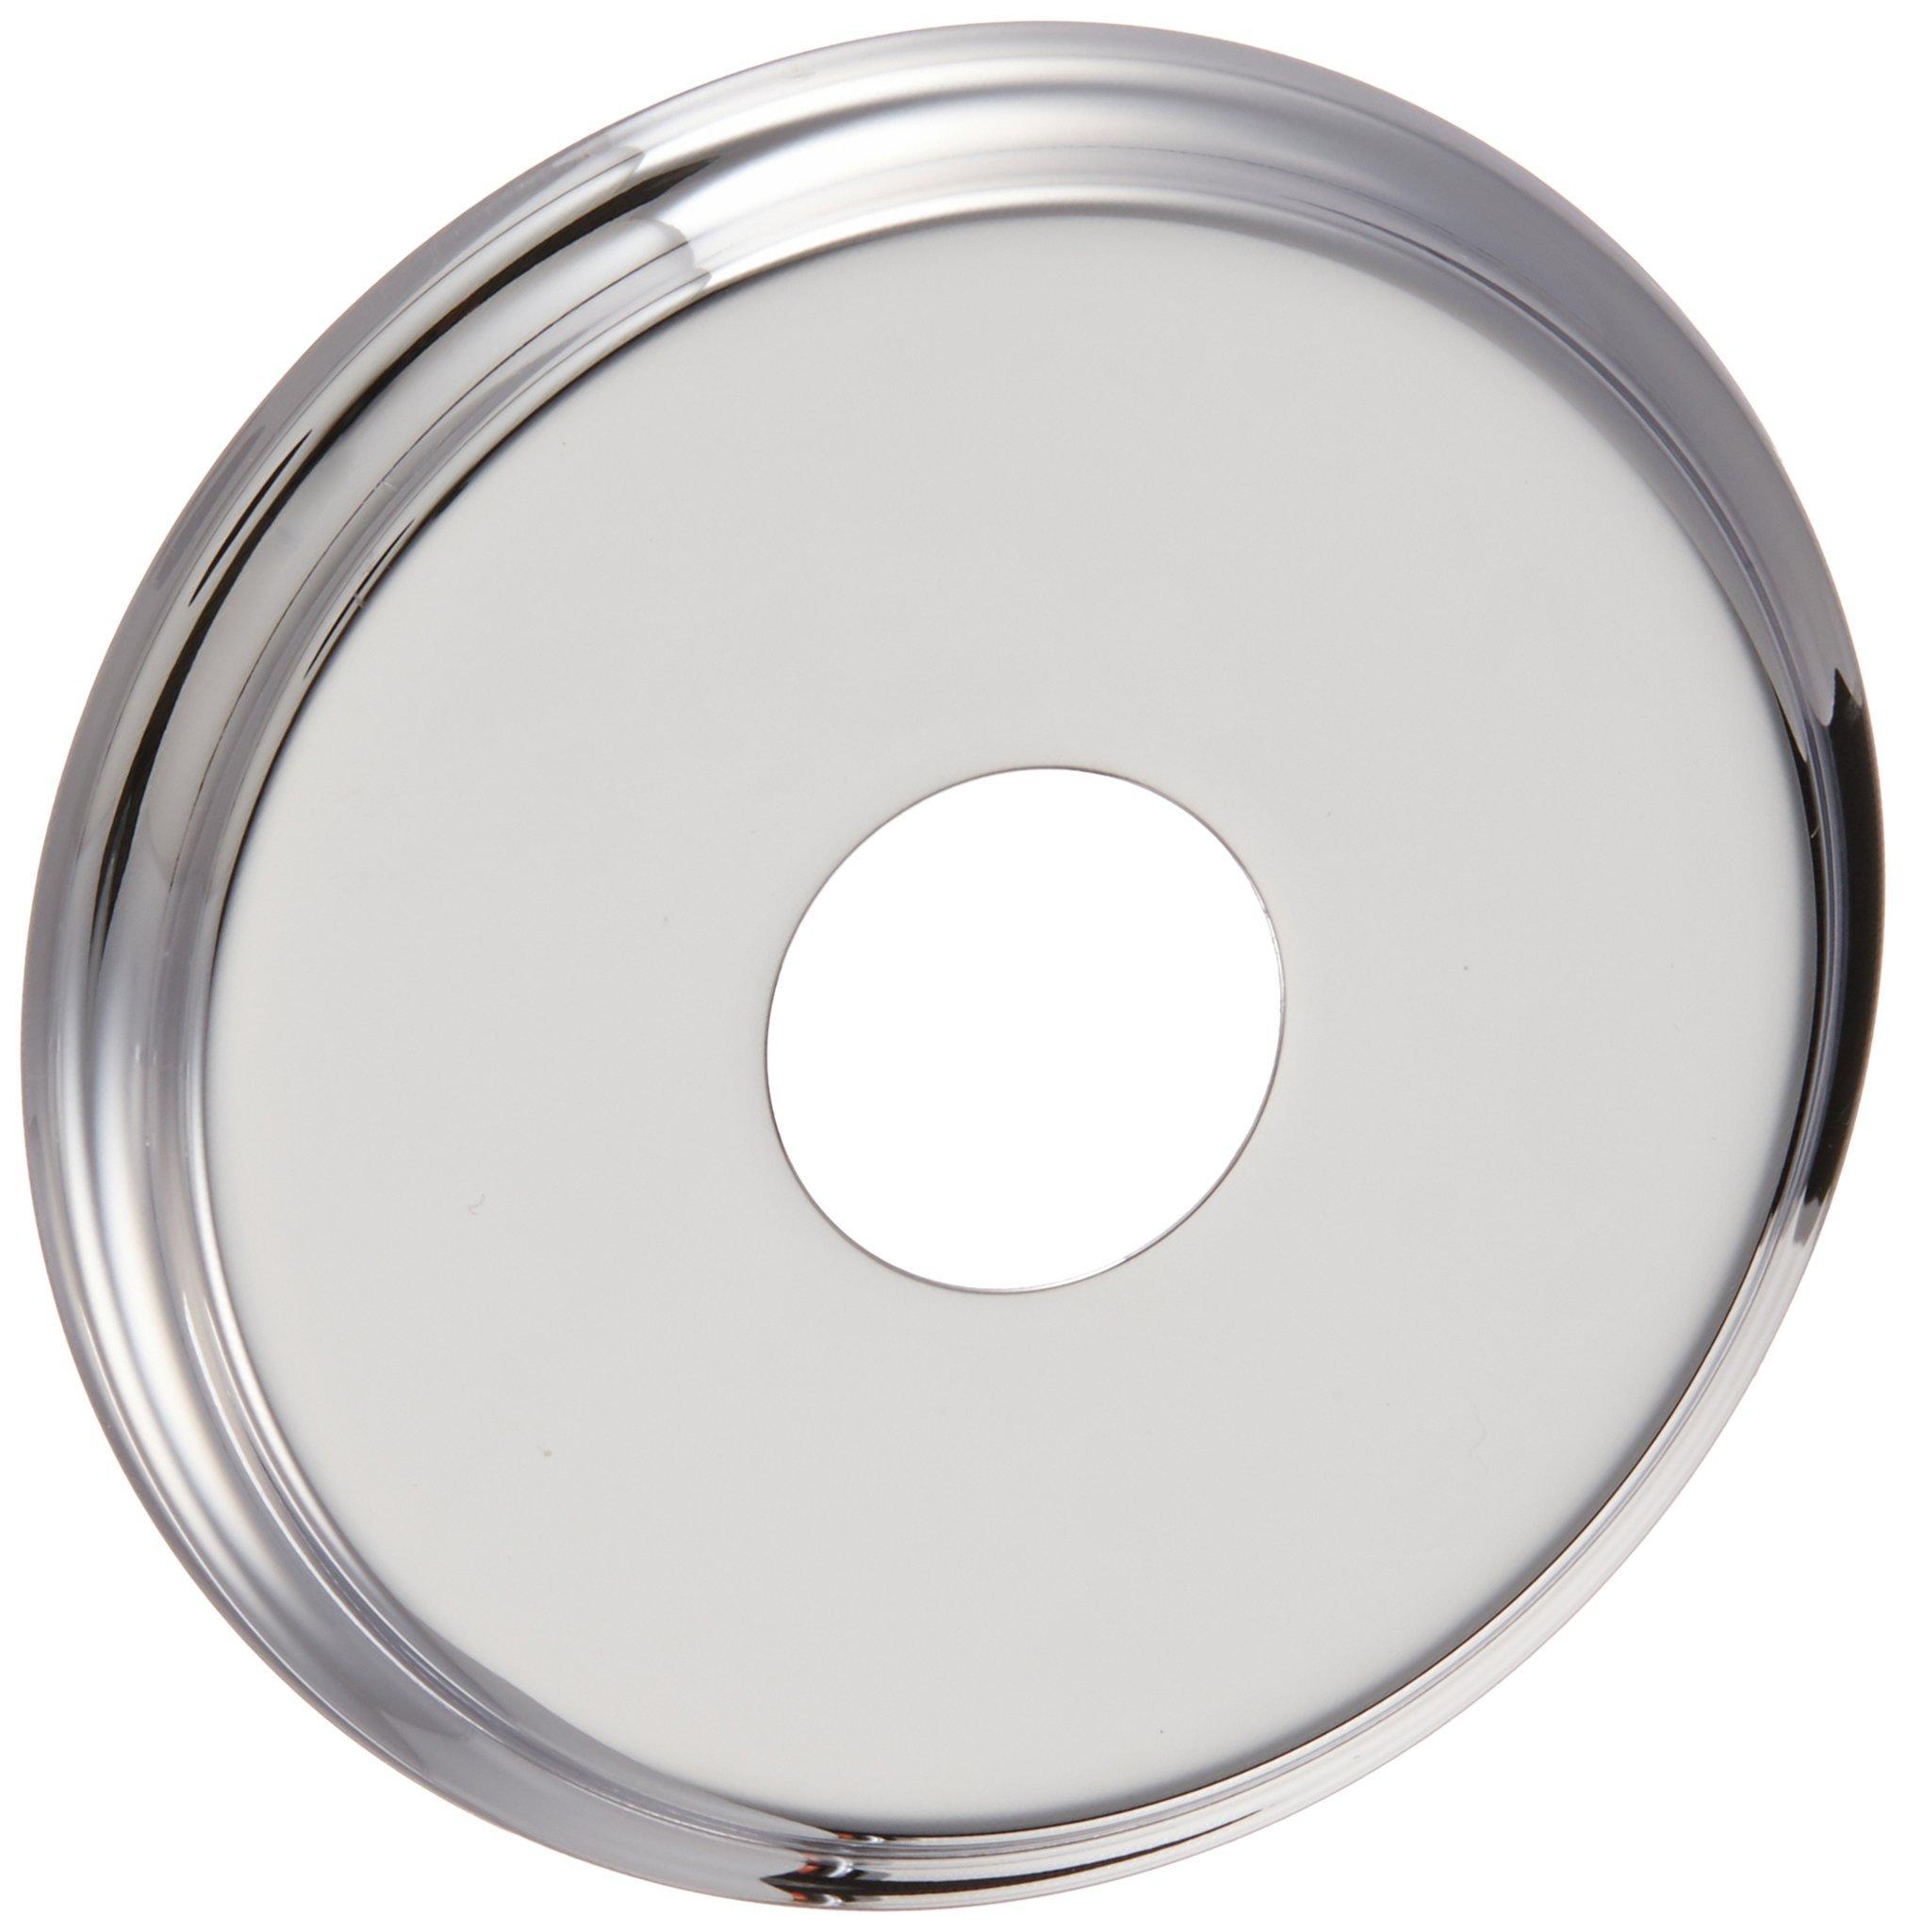 Pfister 960-135A 01 / 801 Series Tub Spout Flange, Chrome